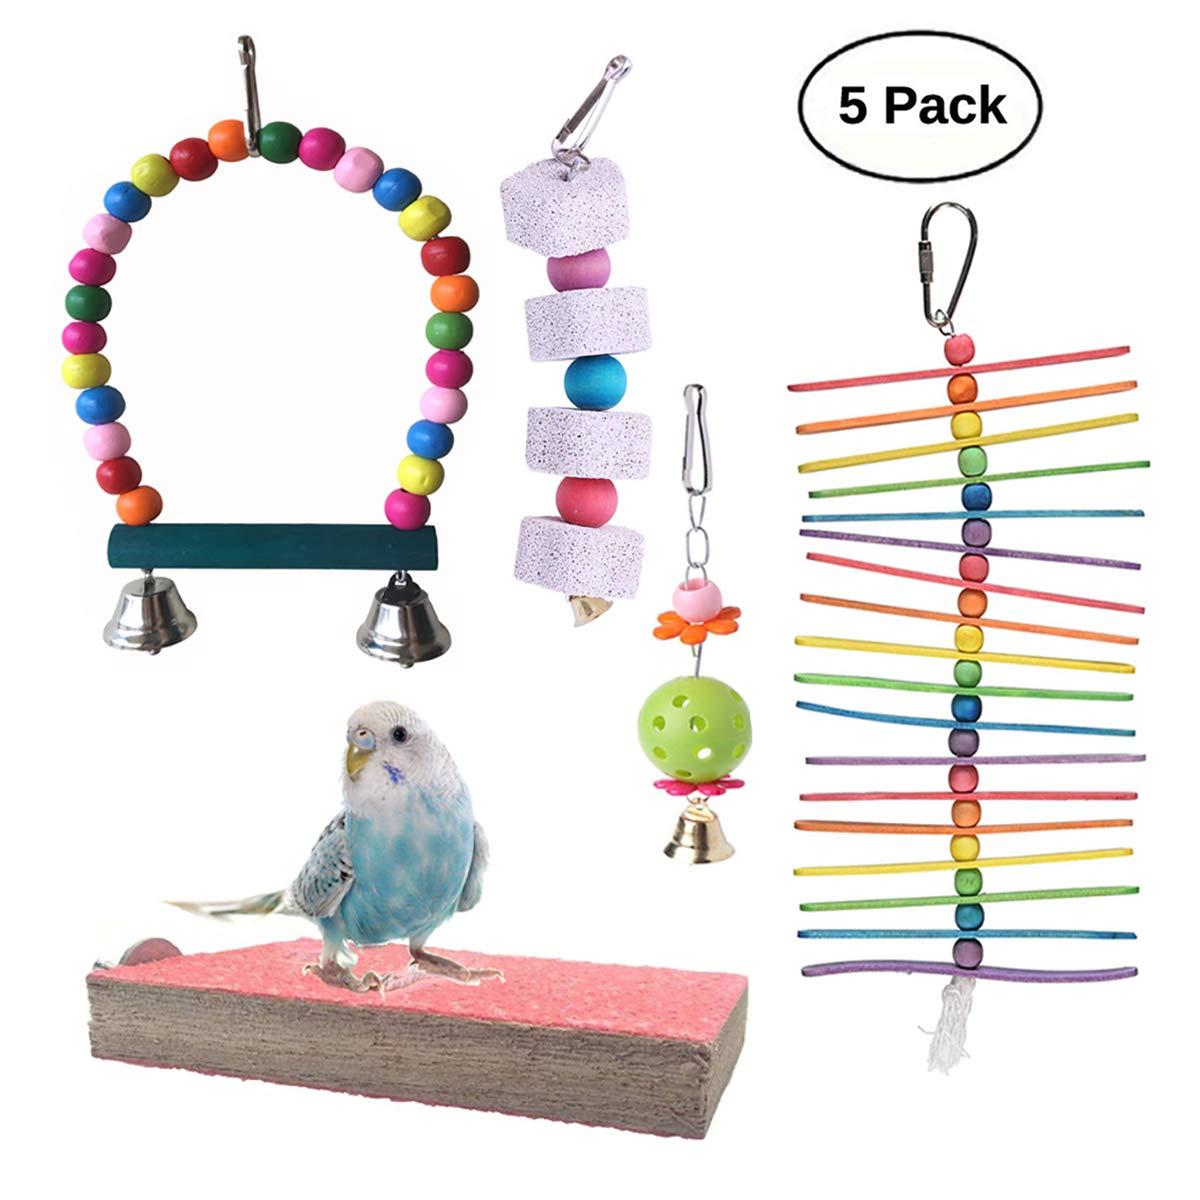 Vehomy 5pcs Parrot Toys Bird Beak Grinding Stone Bird Chewing Toy Bird Hanging Bell Bird Perch Pet Bird Cage Hammock Swing for Parakeets, Cockatiels, Conures, Macaws, Lovebirds, Finches